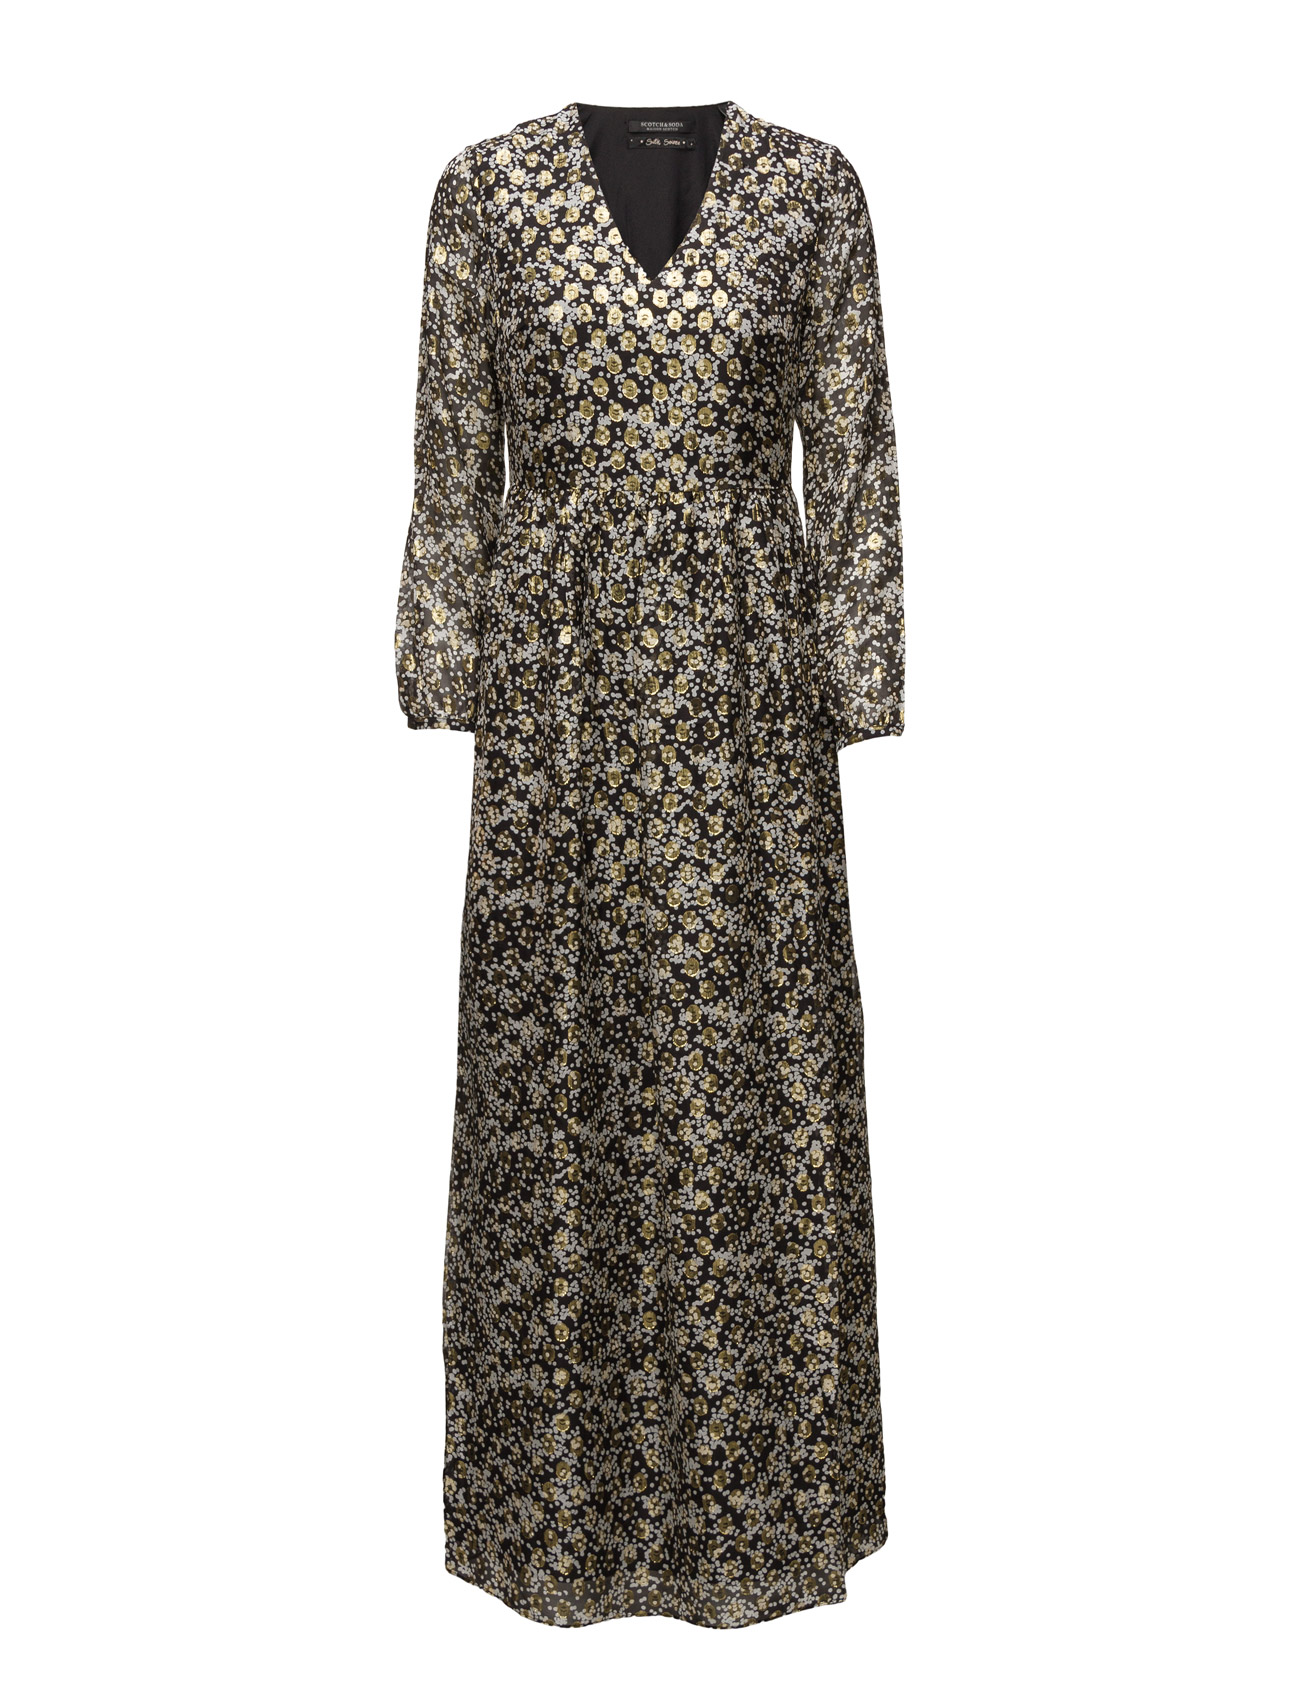 Silk Lurex Jacquard Maxi Dress Maison Scotch Maxi Kjoler til Kvinder i 17 Combo A